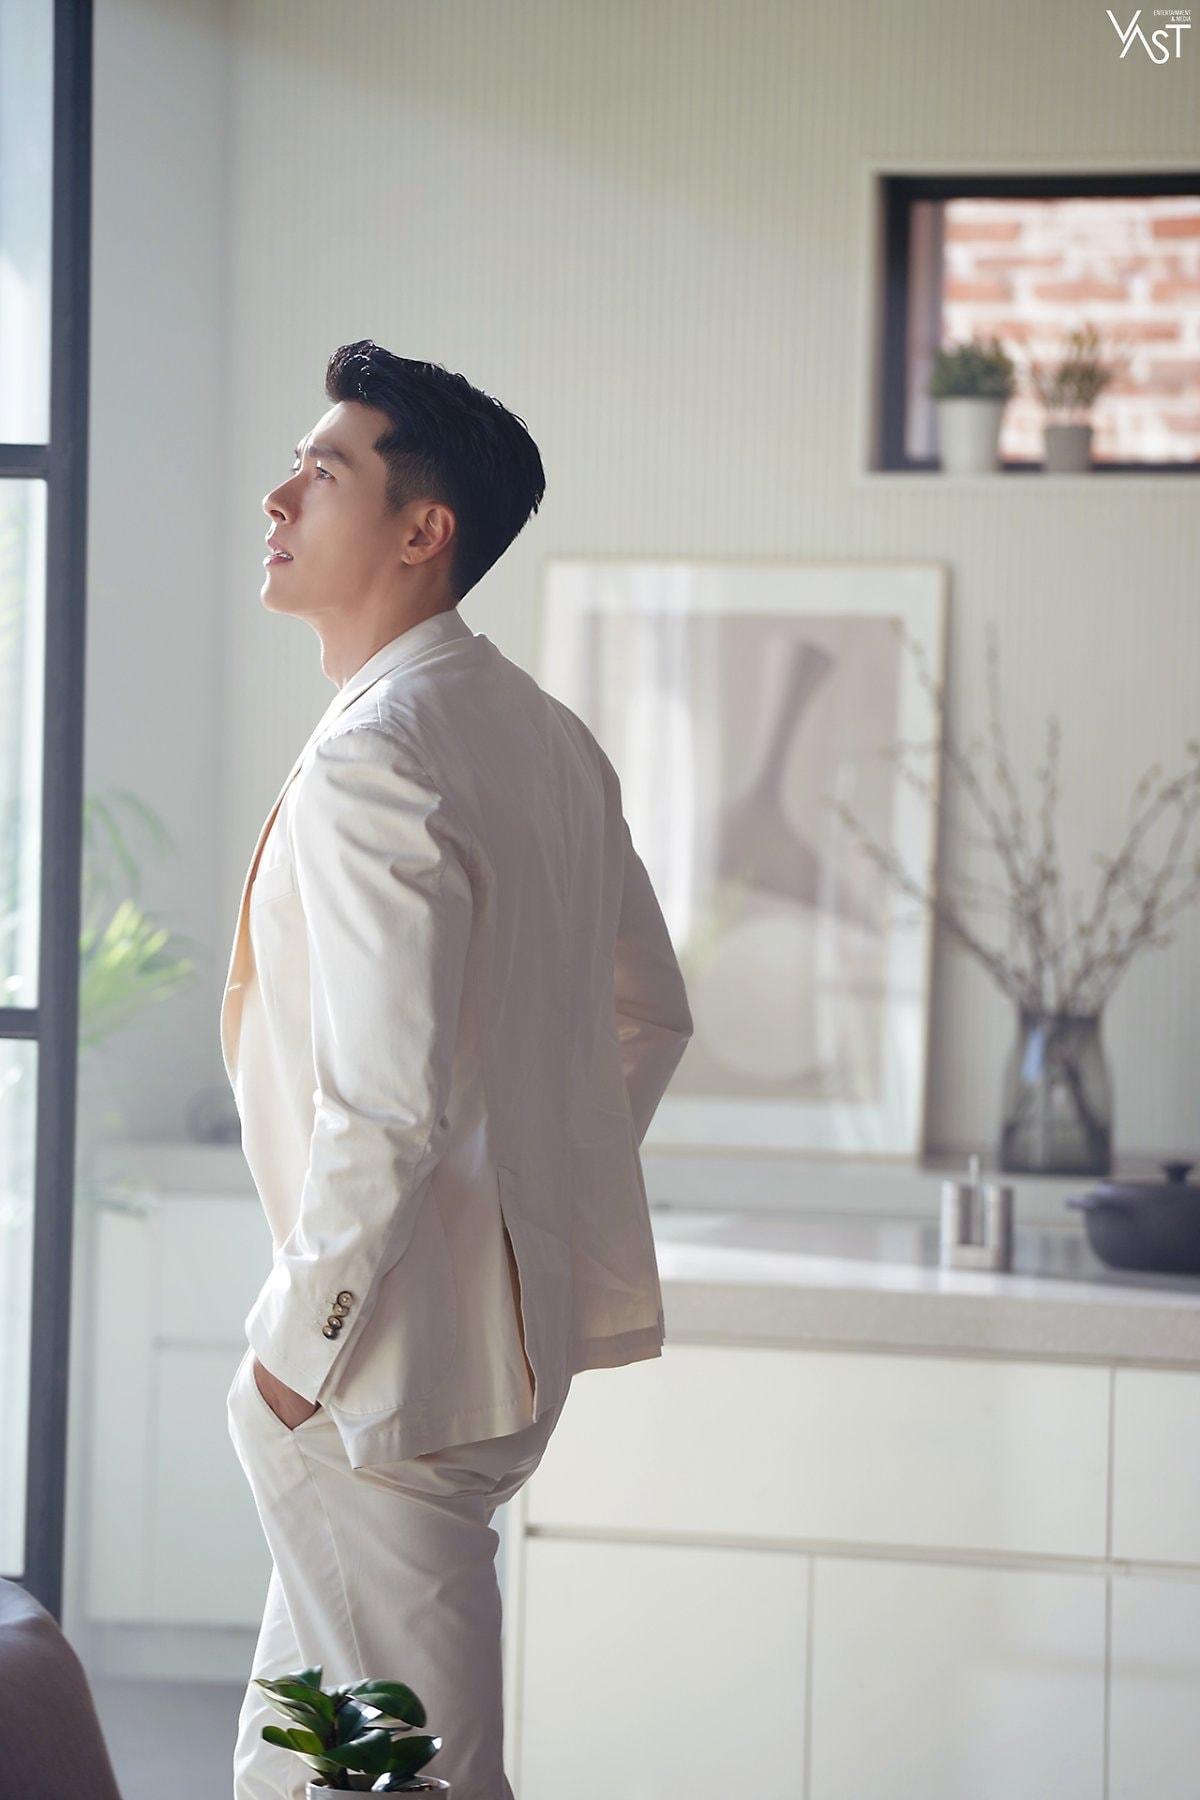 Hyun Bin surprised netizens when he appeared so handsome after Dating Son Ye Jin. 4